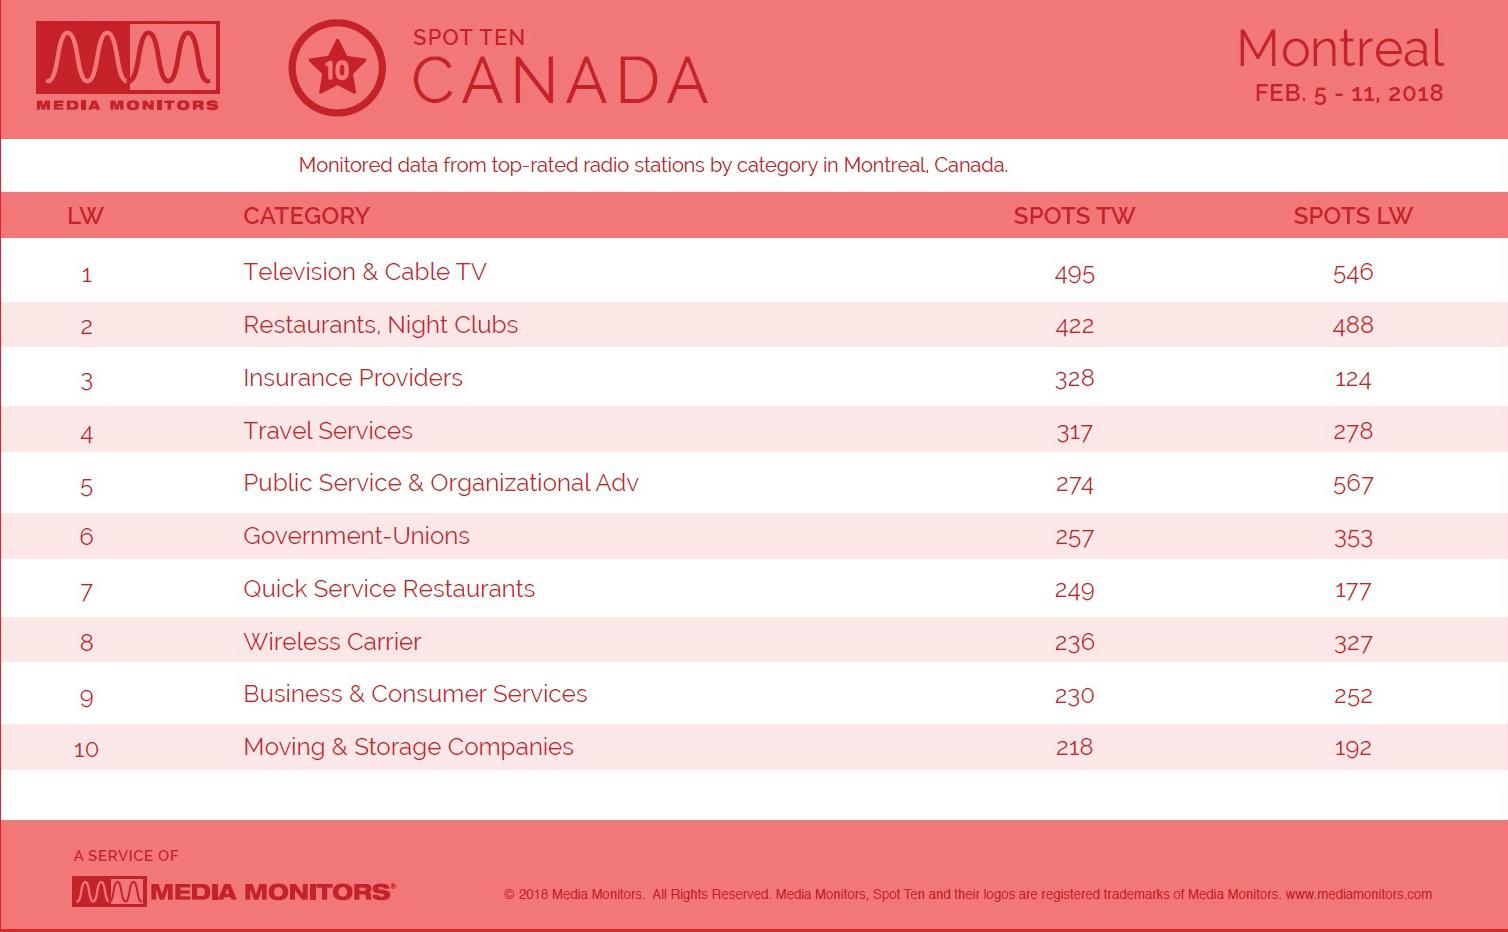 MontrealCategories